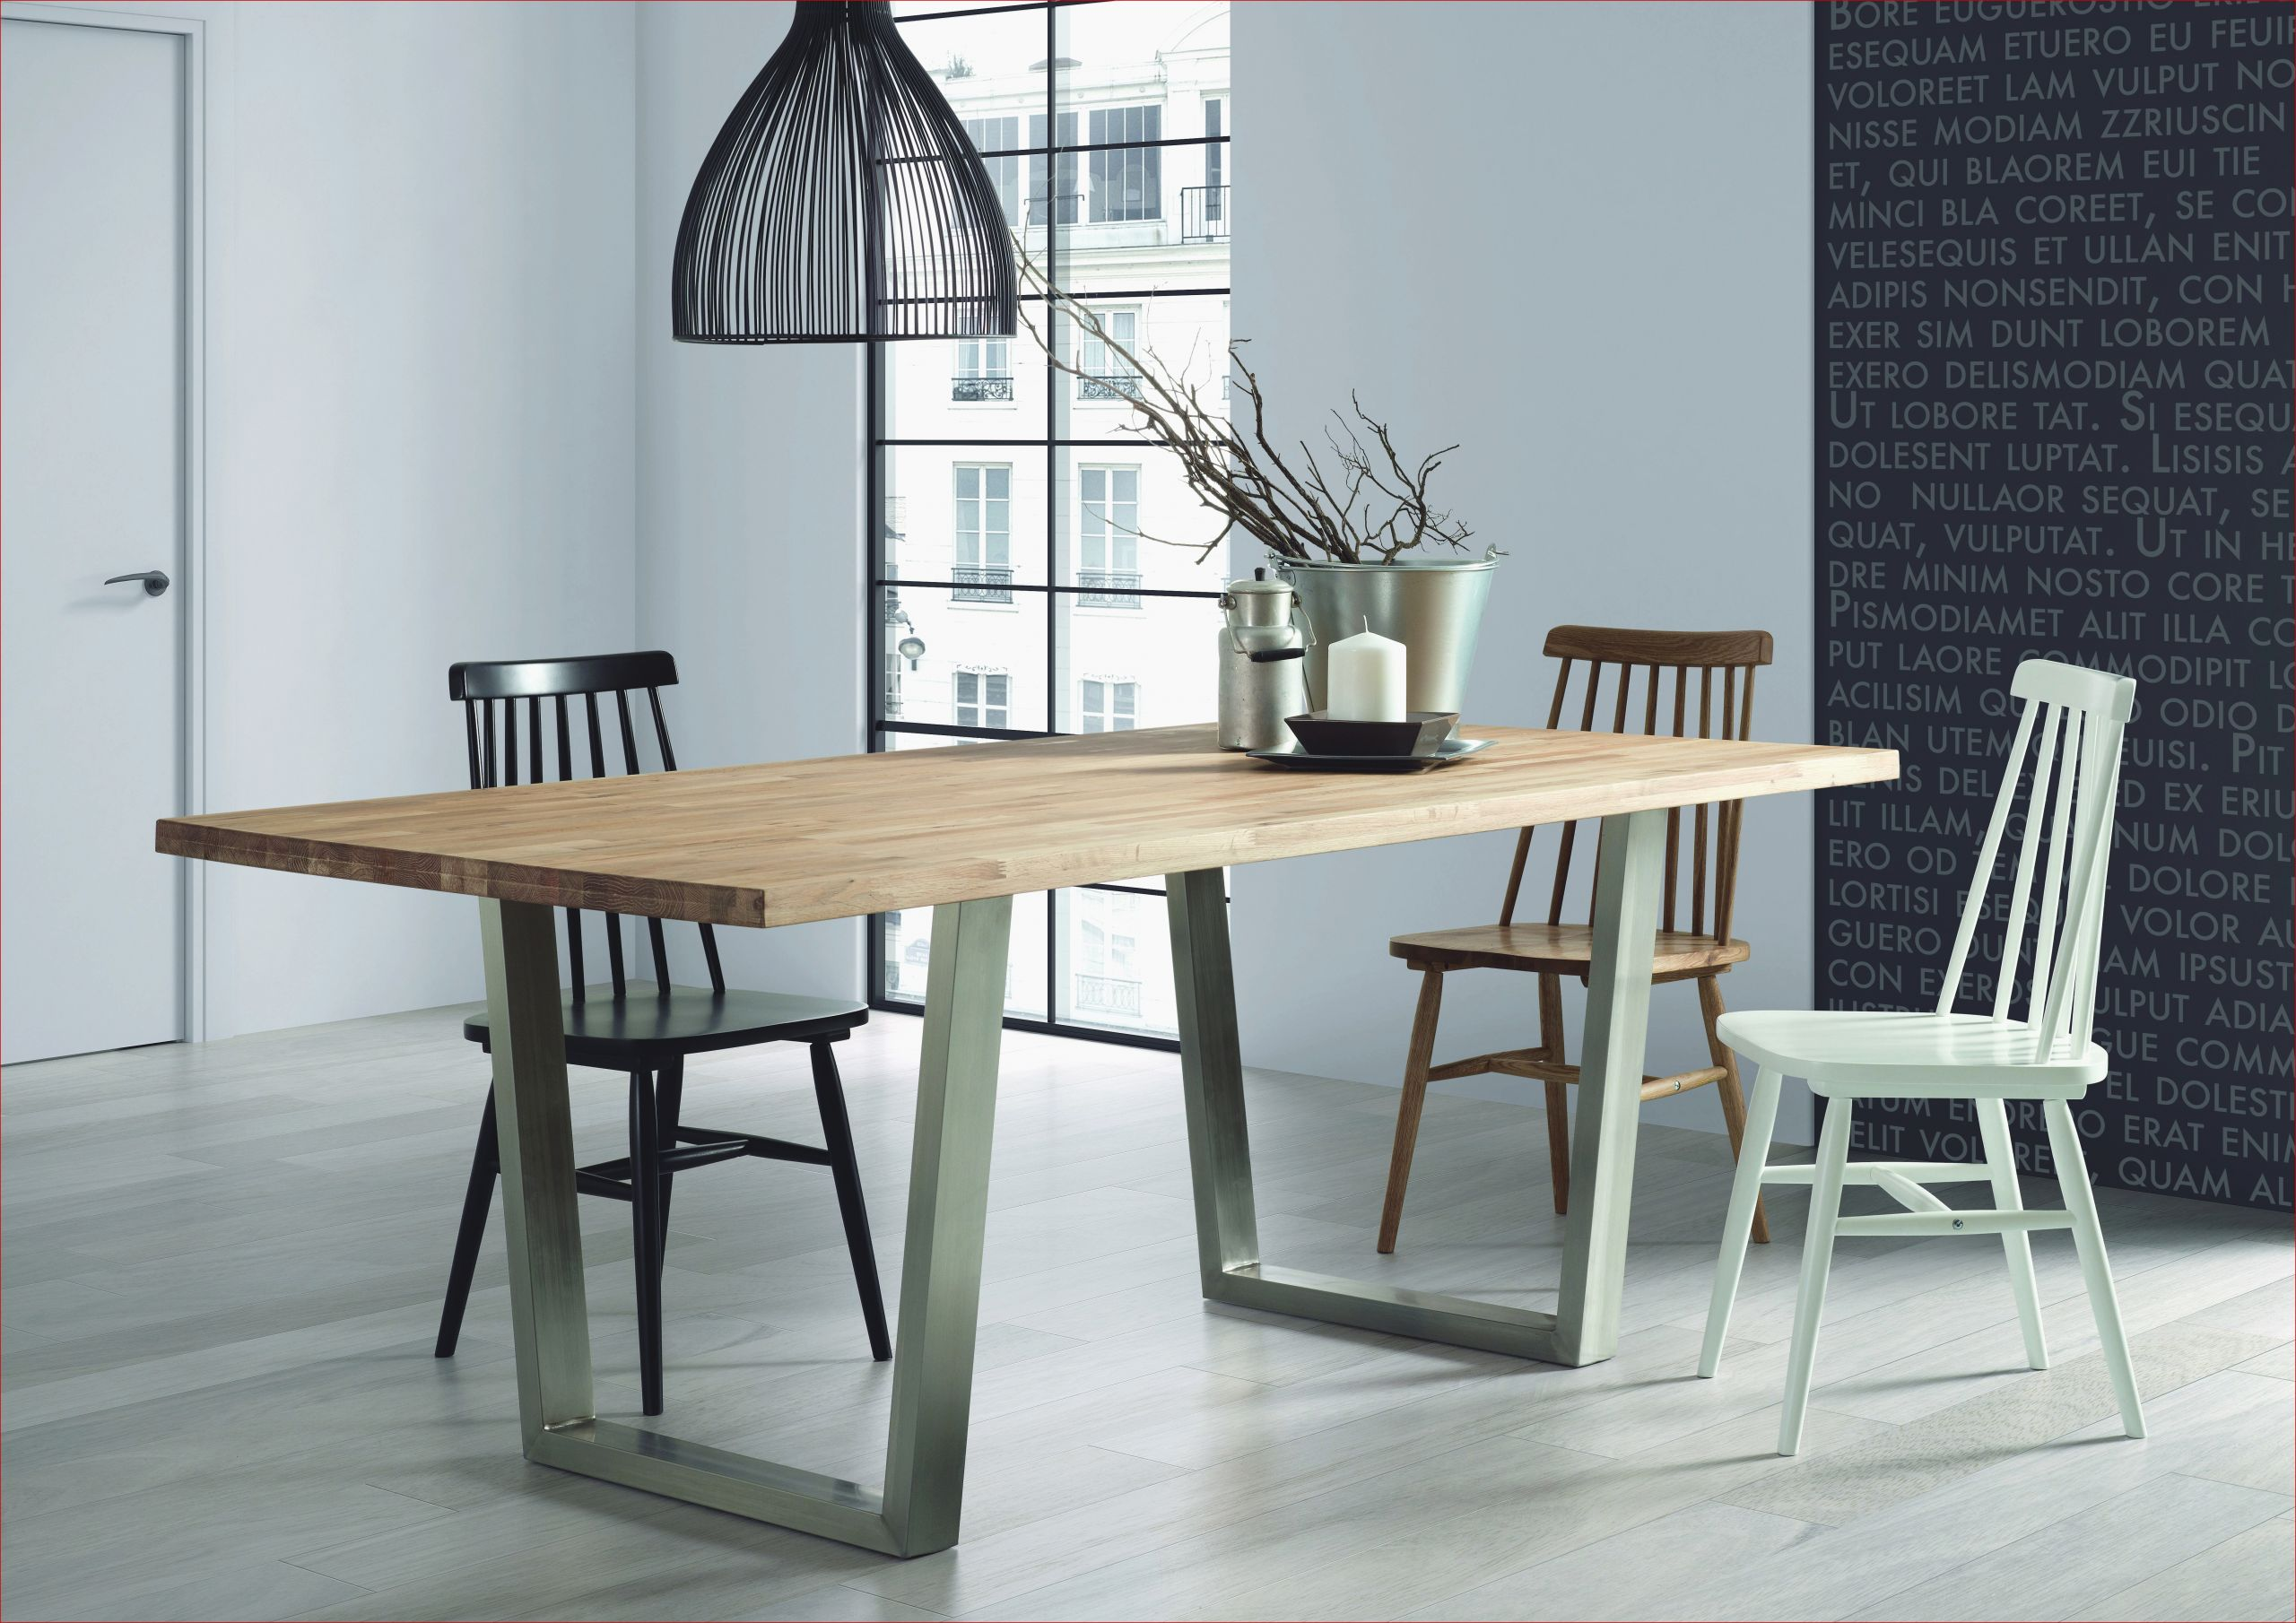 chaises de salle a manger conforama impressionnant conforama chaise de salle c280 manger genial cuisine fauteuil salle a of chaises de salle a manger conforama